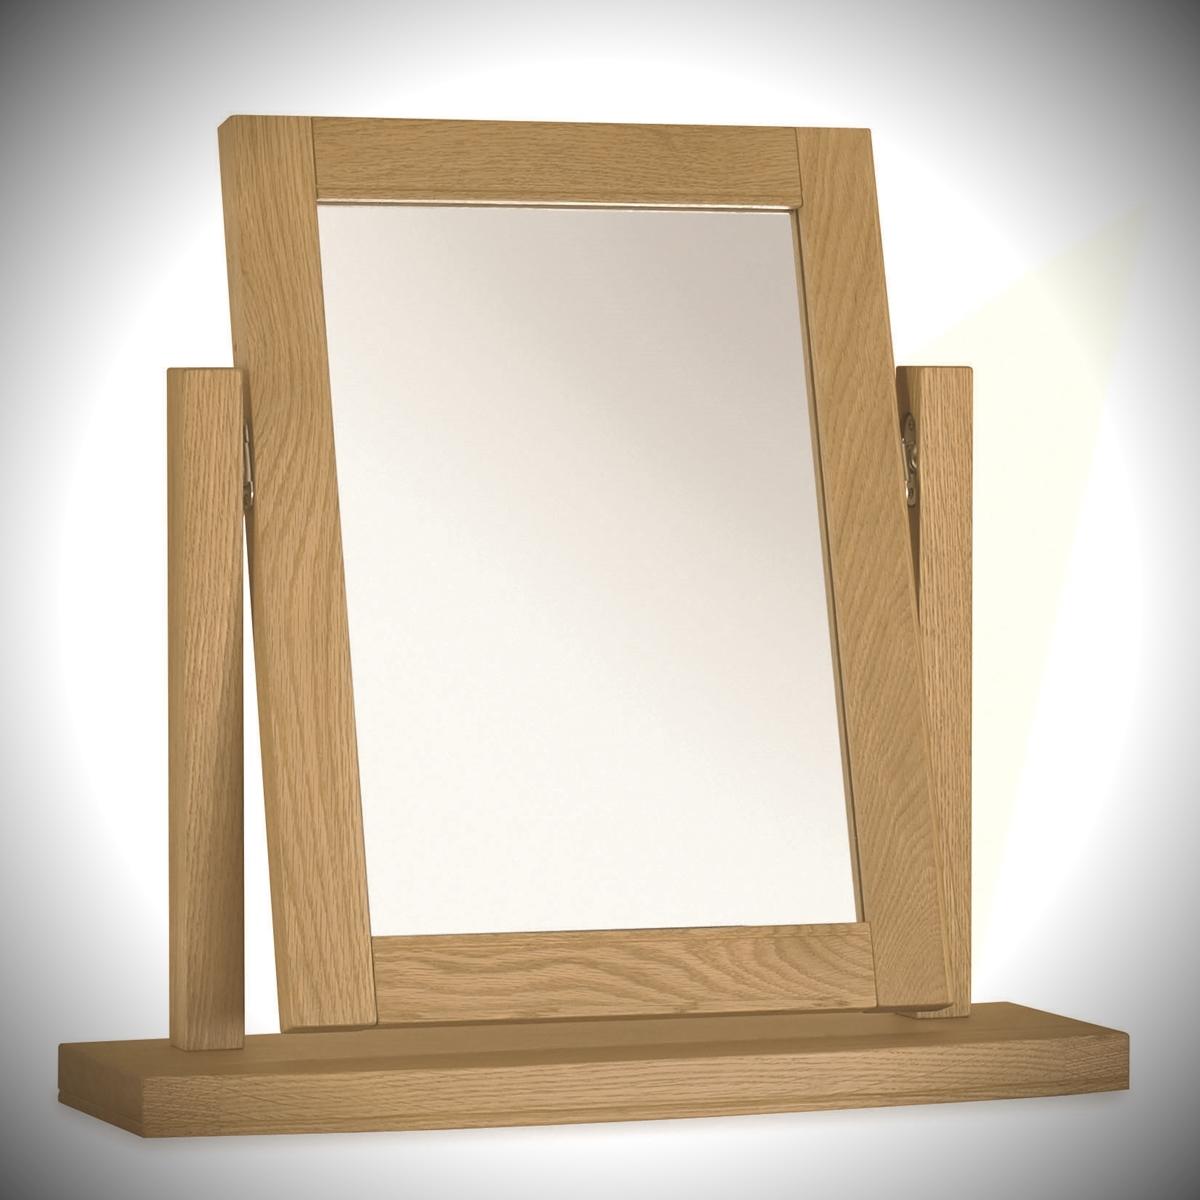 Oak Bedroom Vanity Bedroom Furniture Furniture Store In Leicester World Of Furniture